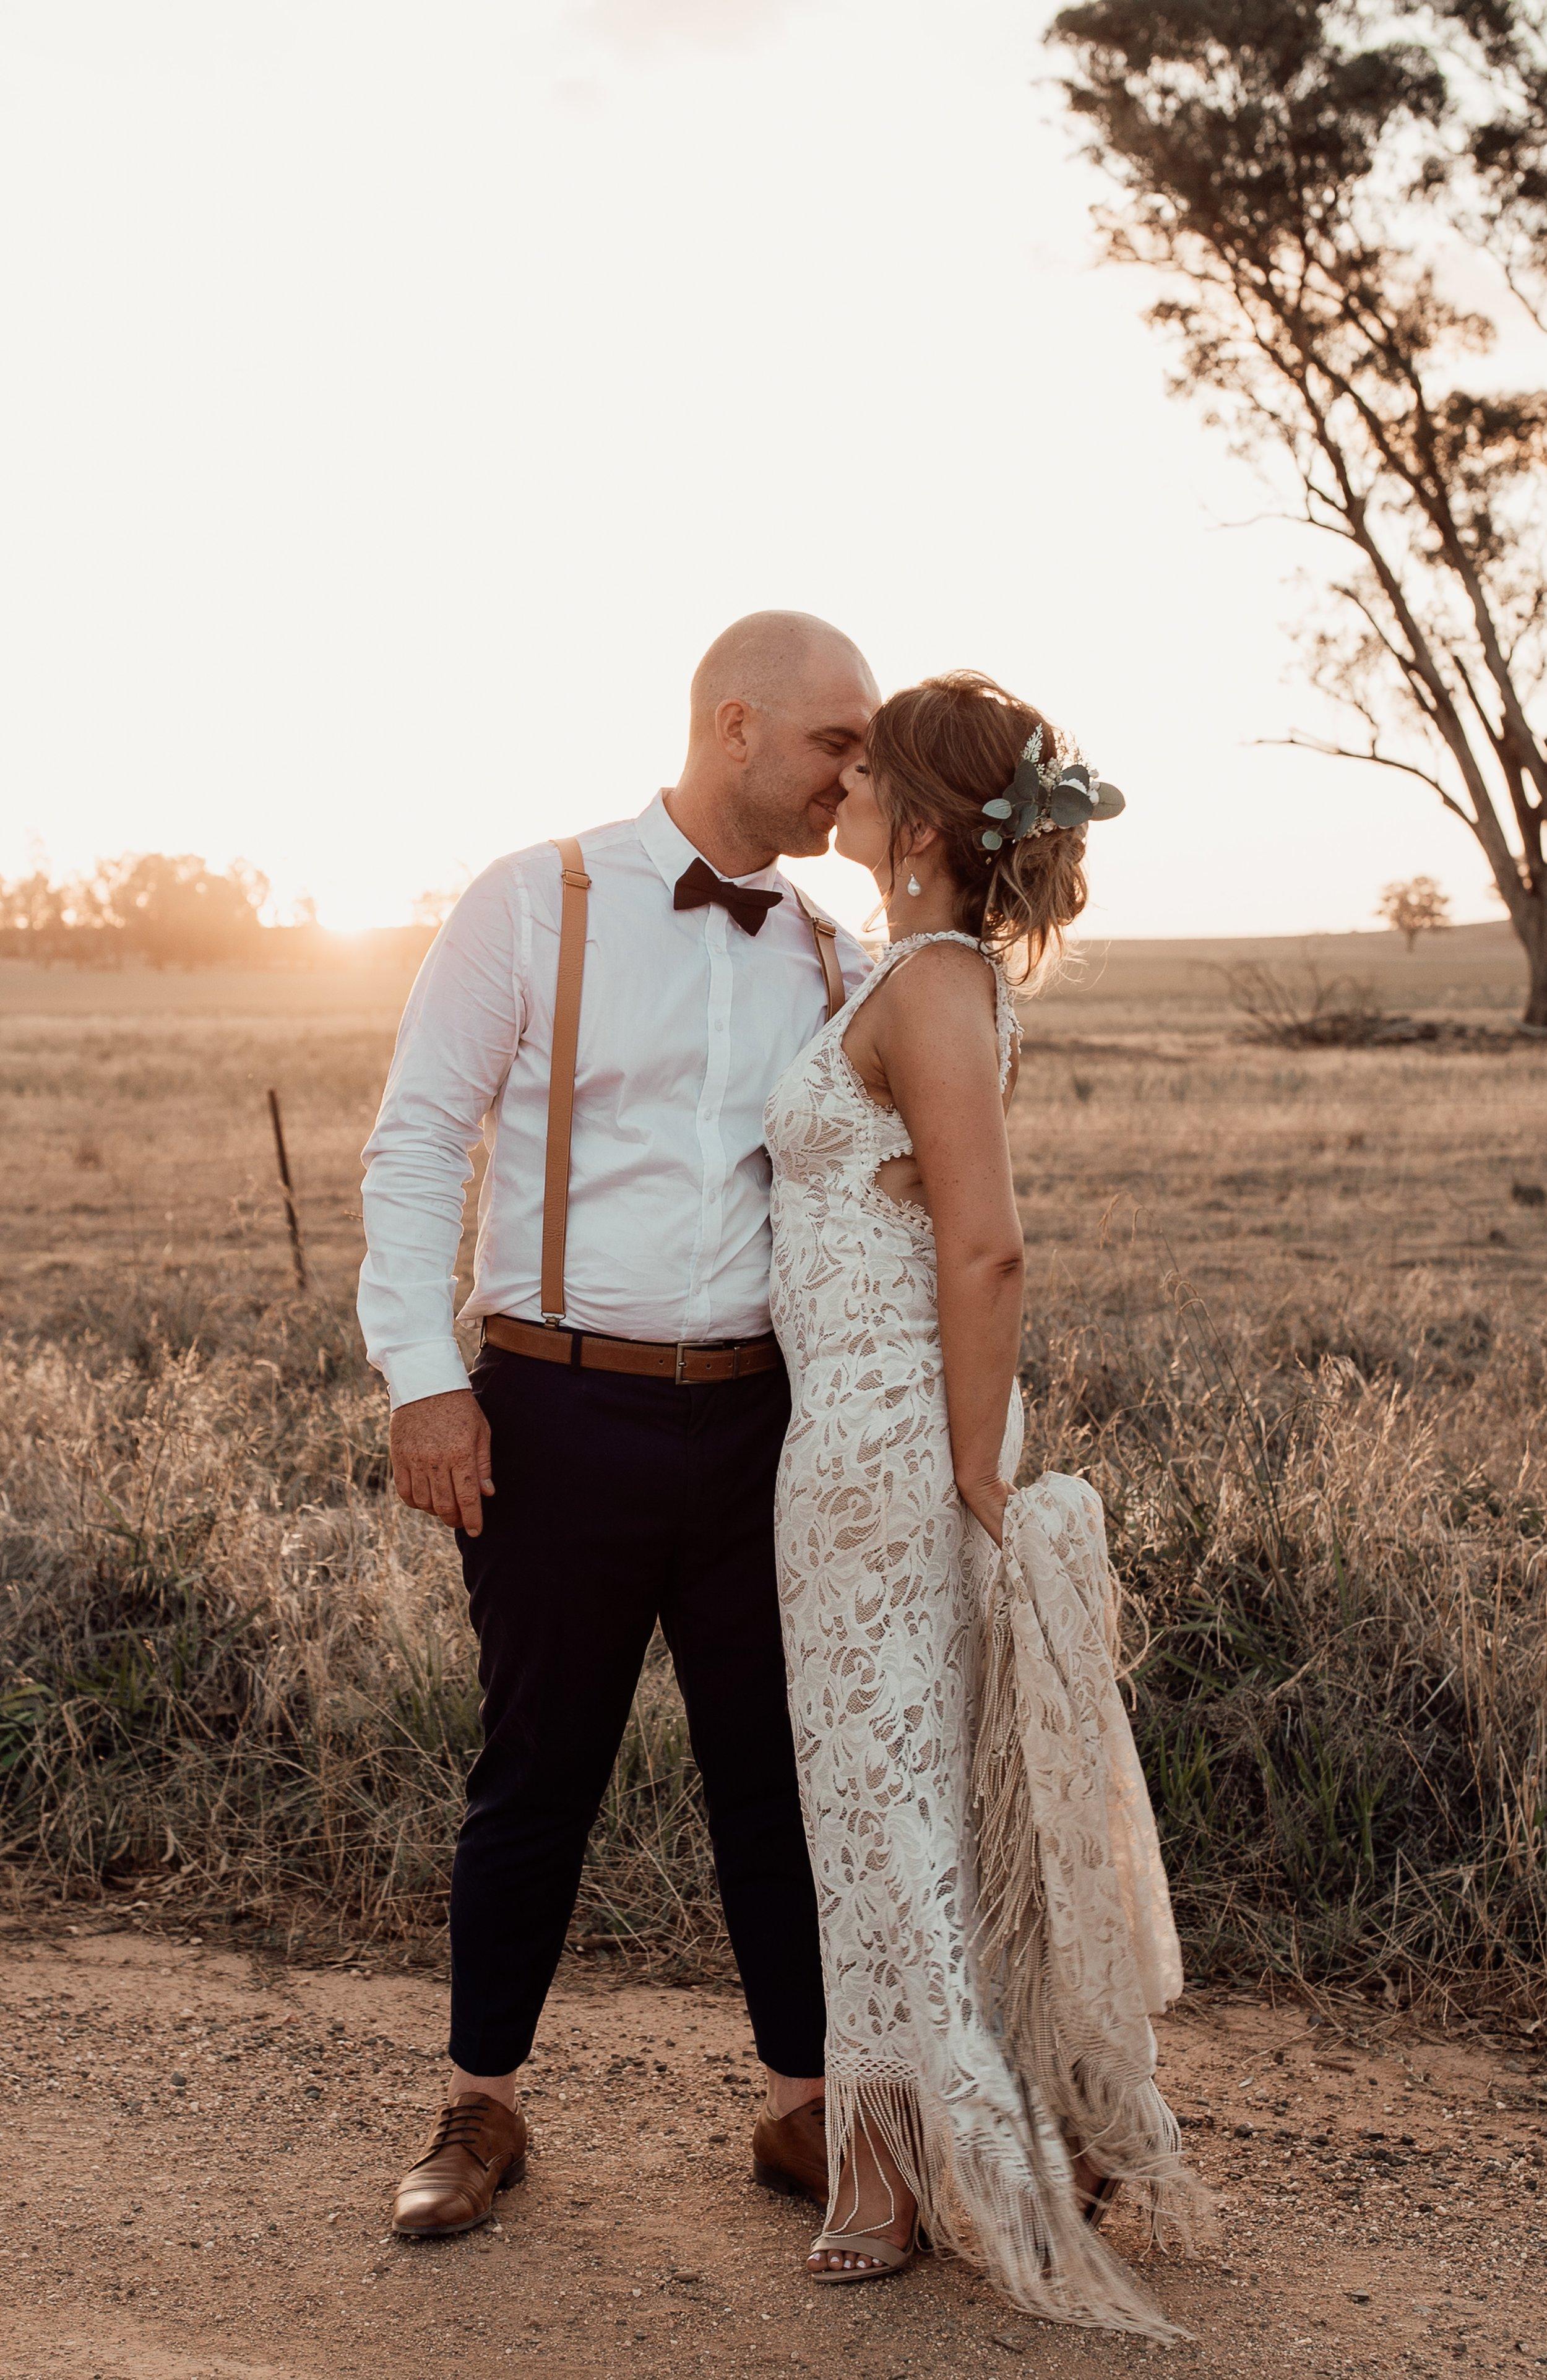 mickalathomas_puremacphotography_weddingphotographer_couplephotographer_Sheppartonphotographer_1470.jpg